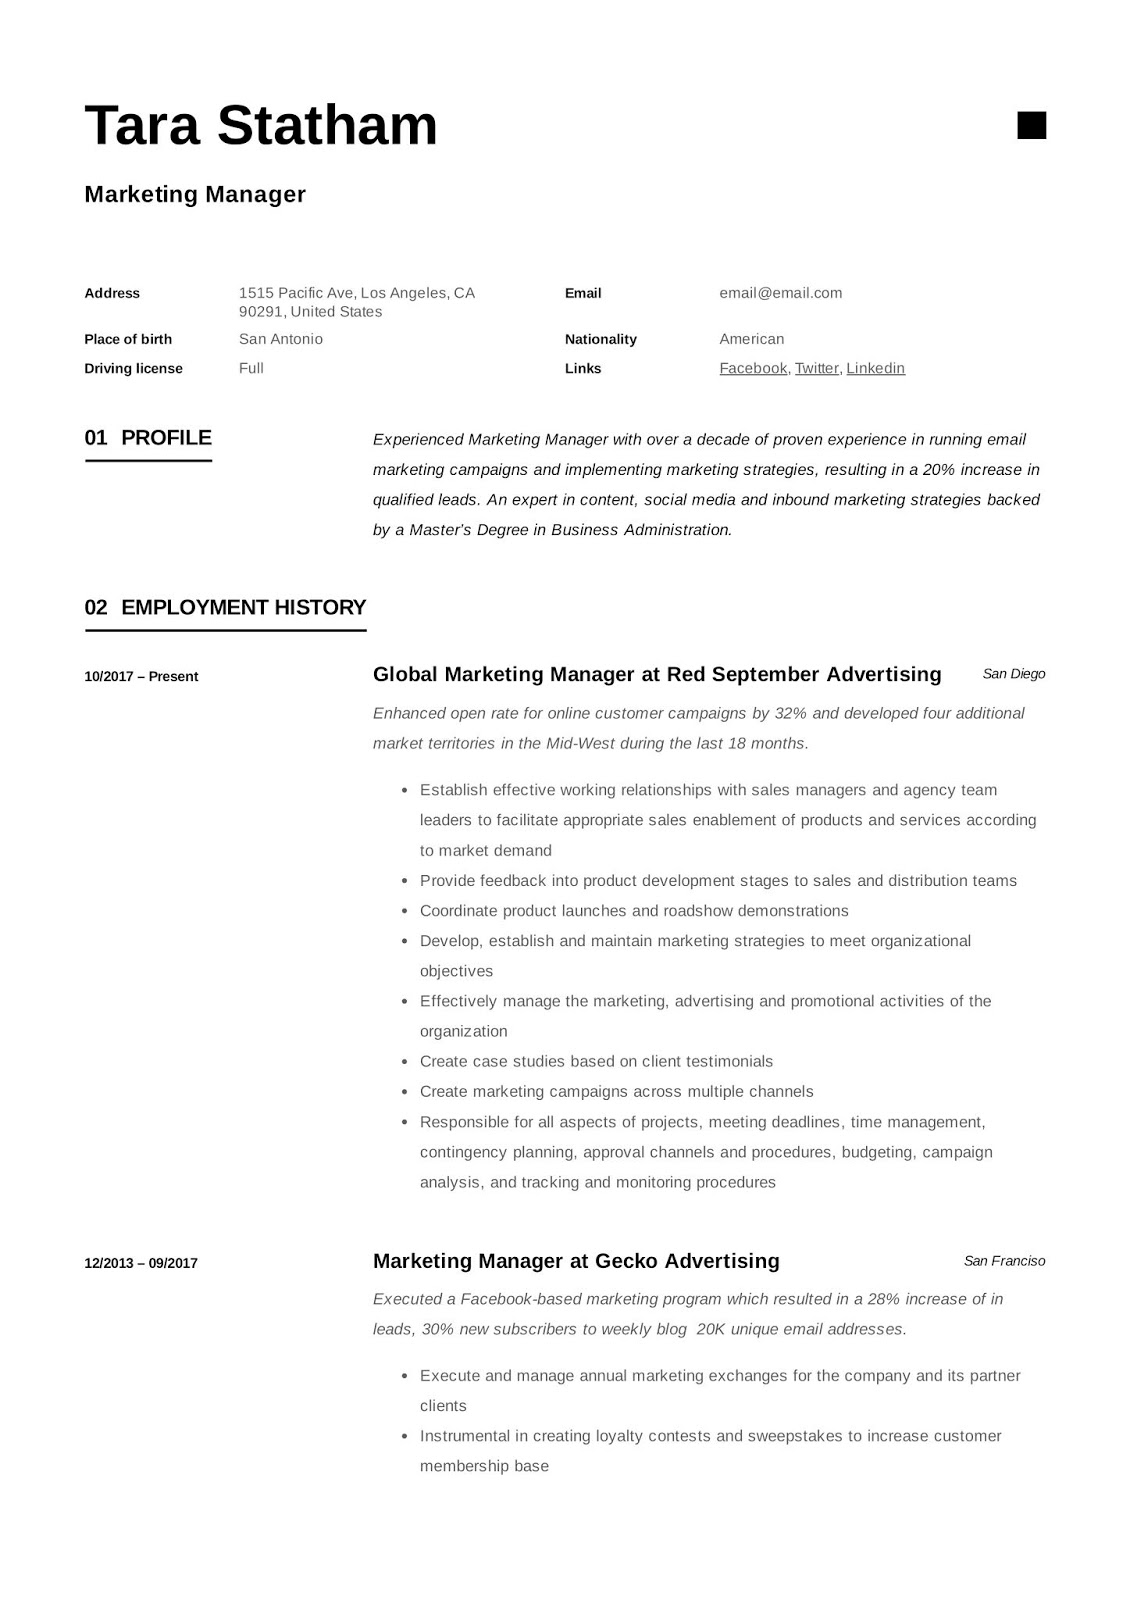 marketing manager cv example, marketing manager cv example 2018, marketing manager cv examples uk, marketing manager cv example uk, marketing communications manager cv examples, assistant marketing manager resume examples, trade marketing manager resume examples, sales and marketing manager cv example